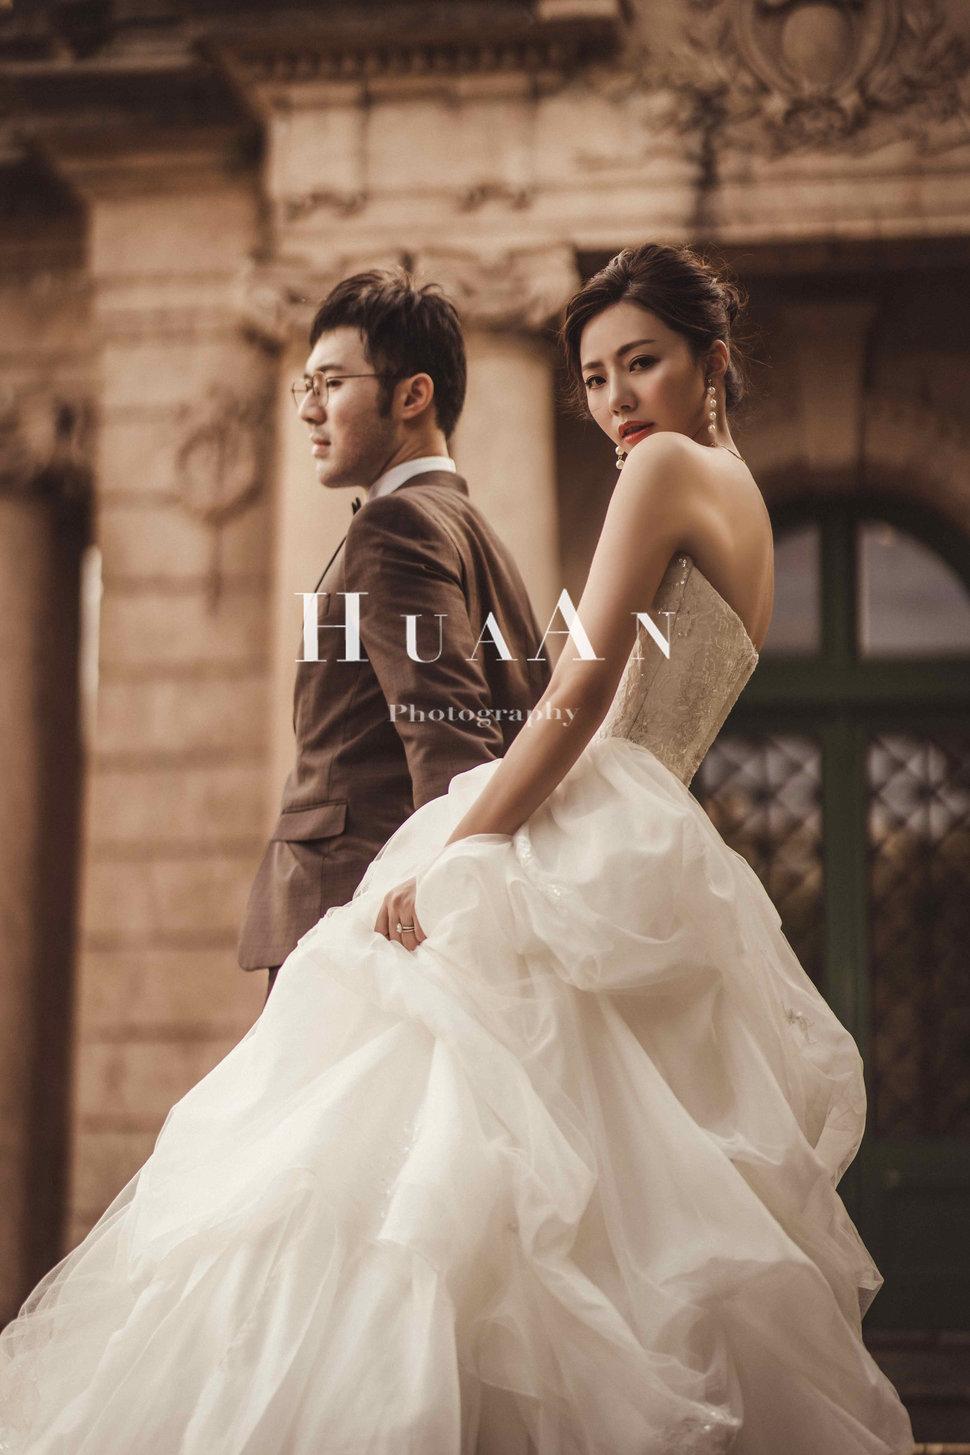 DSC01939 - Huaan Photography《結婚吧》